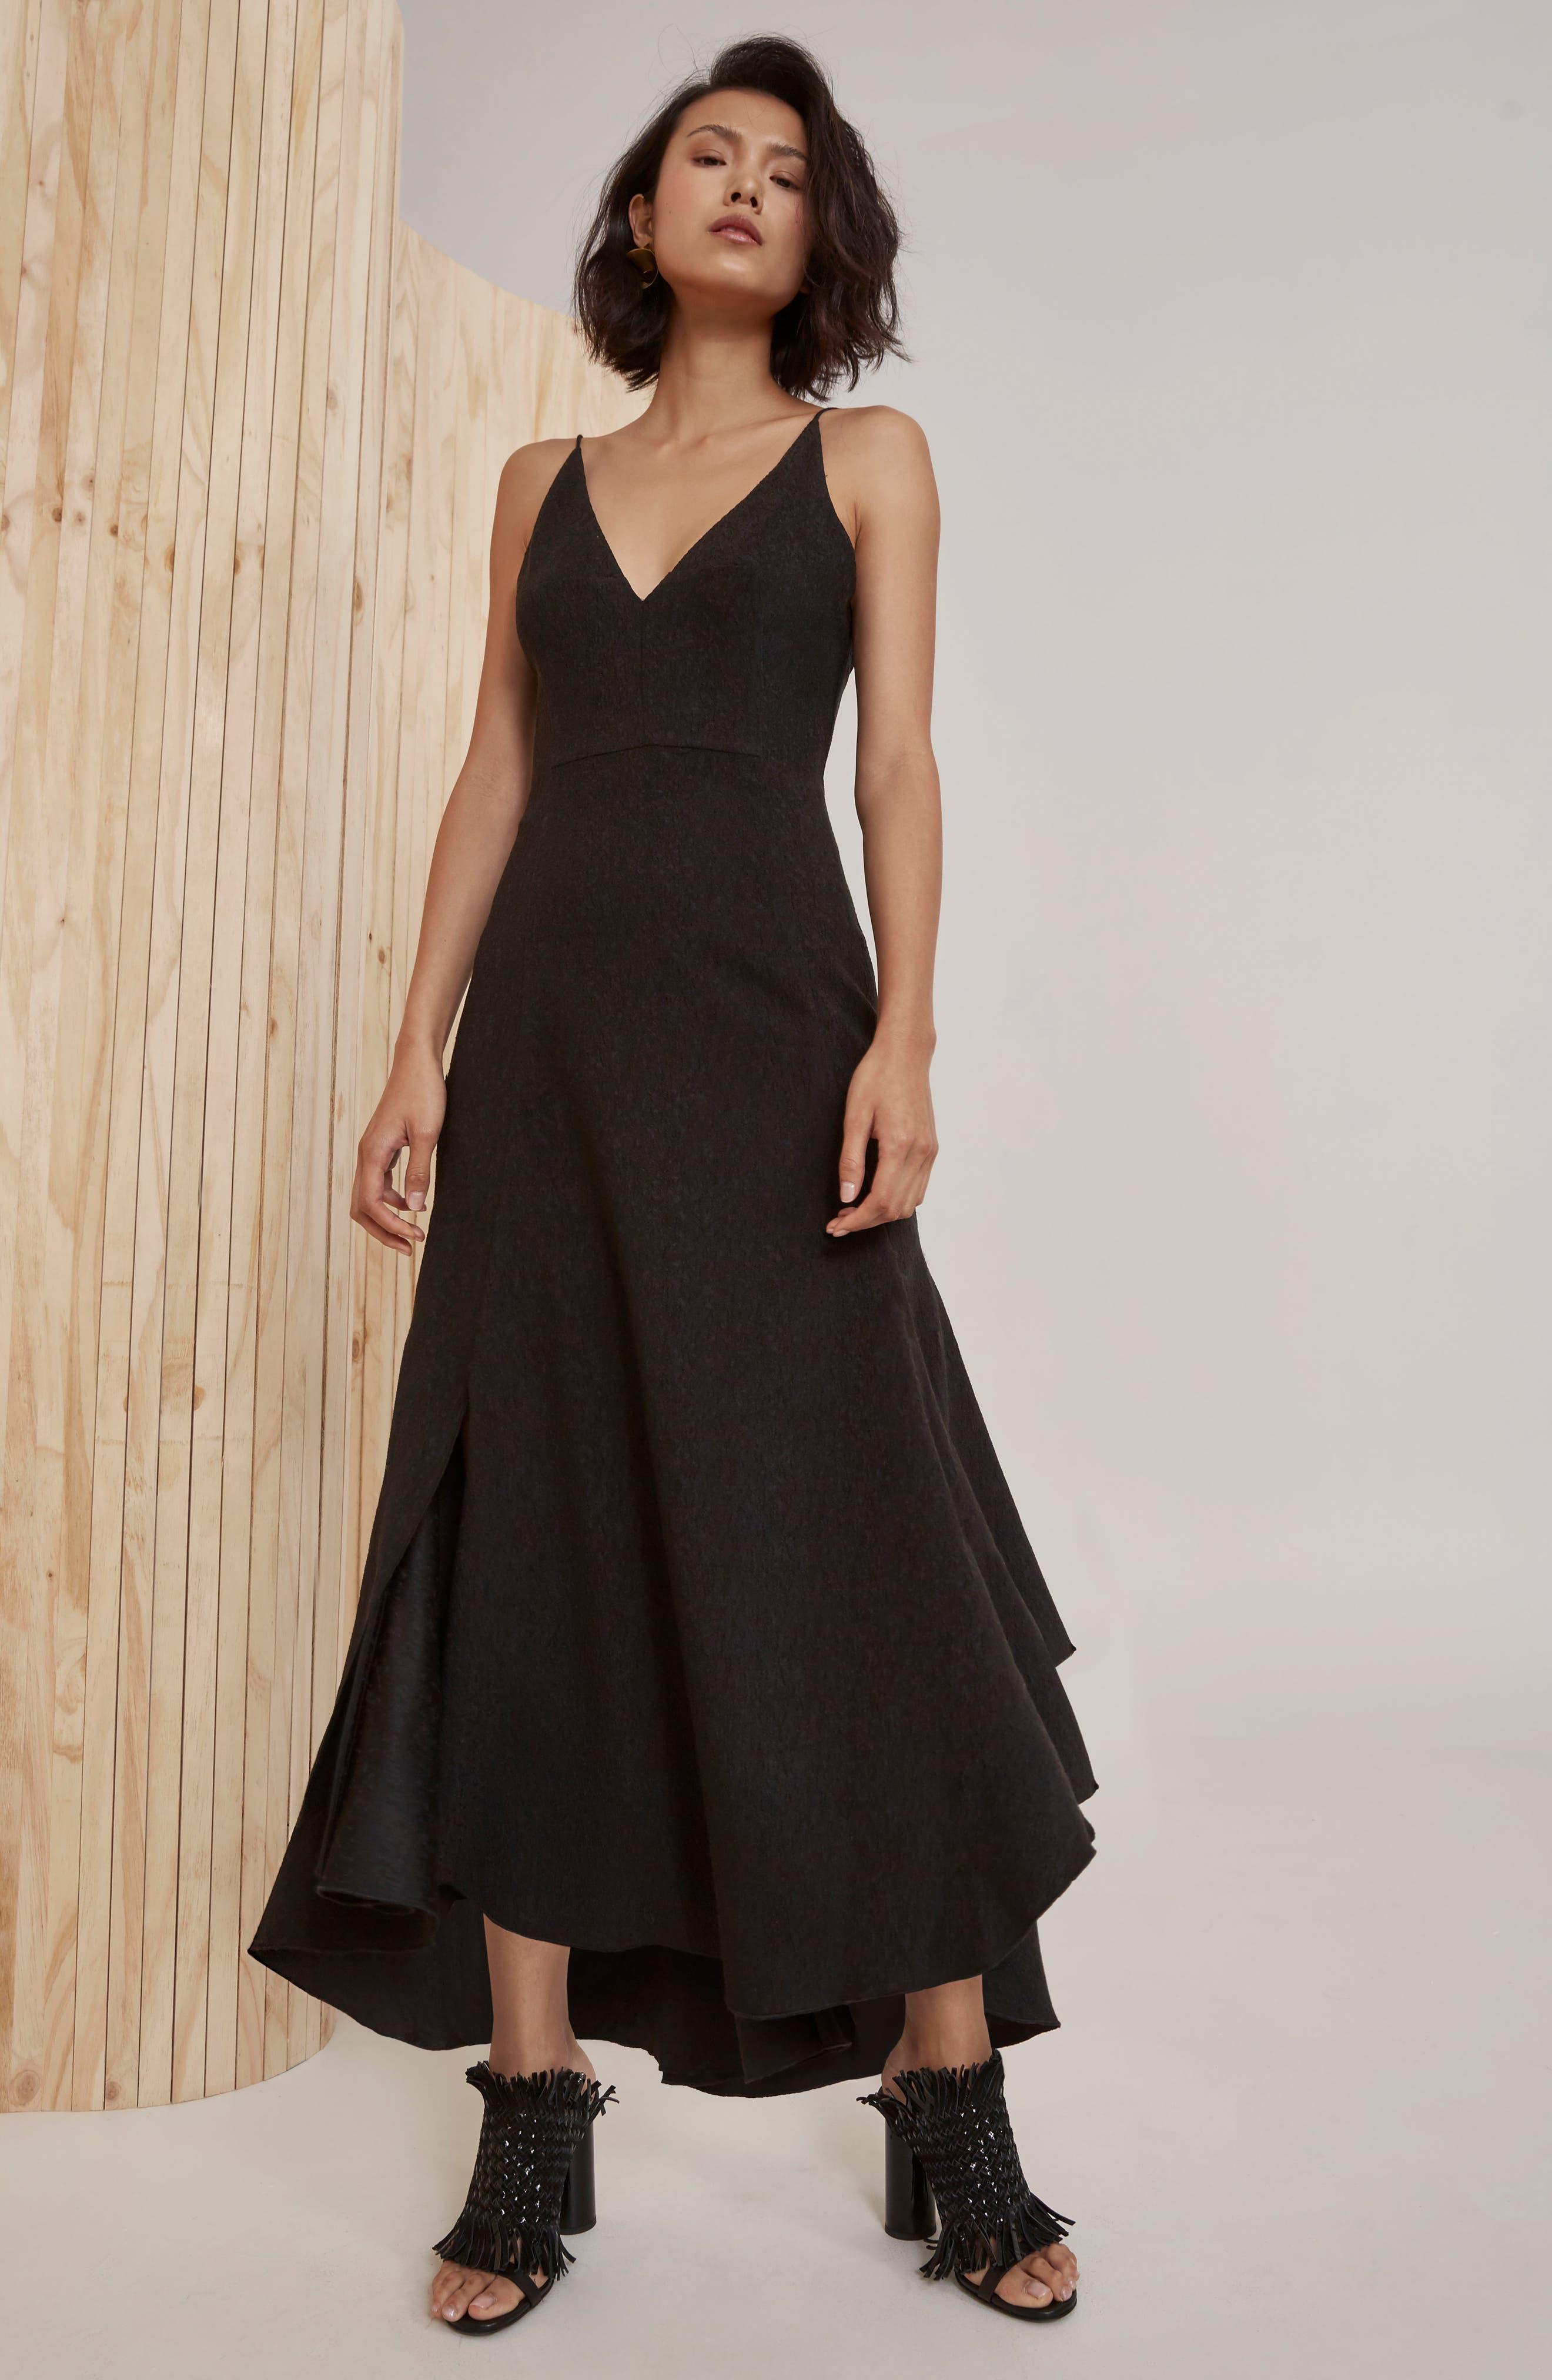 I Dream It Fit & Flare Dress,                             Alternate thumbnail 7, color,                             001